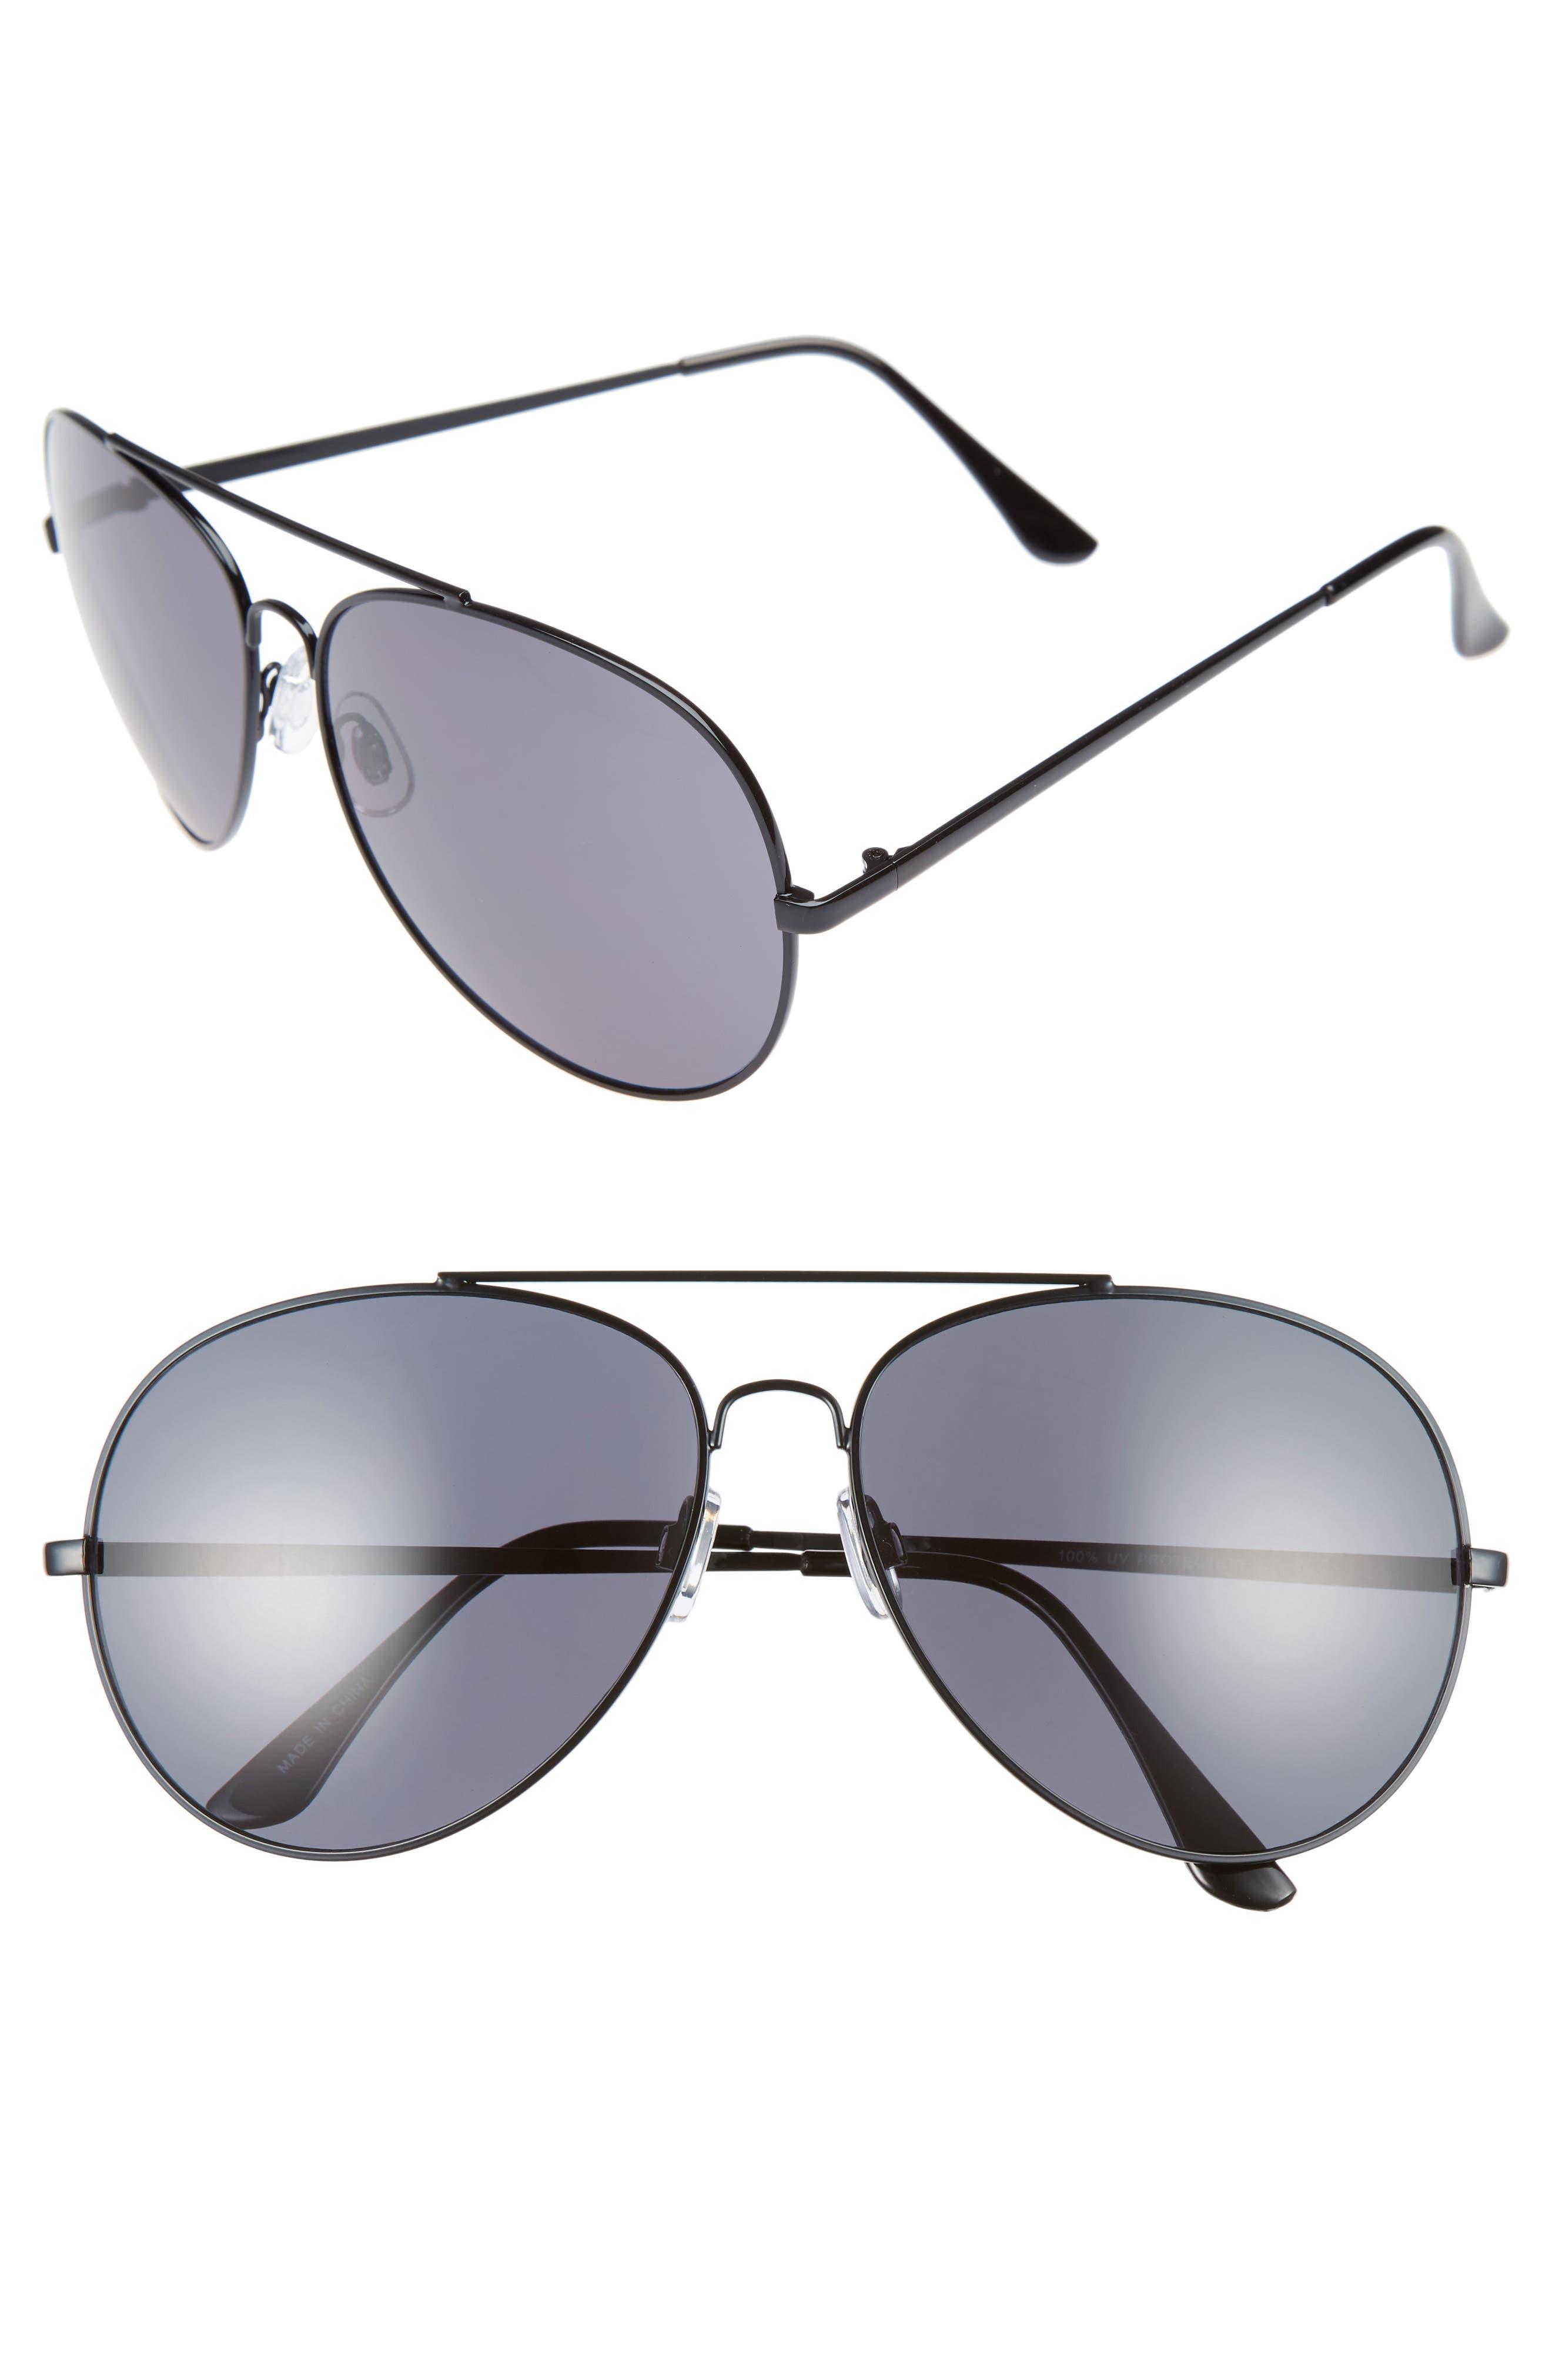 65mm Oversize Aviator Sunglasses,                         Main,                         color, 001